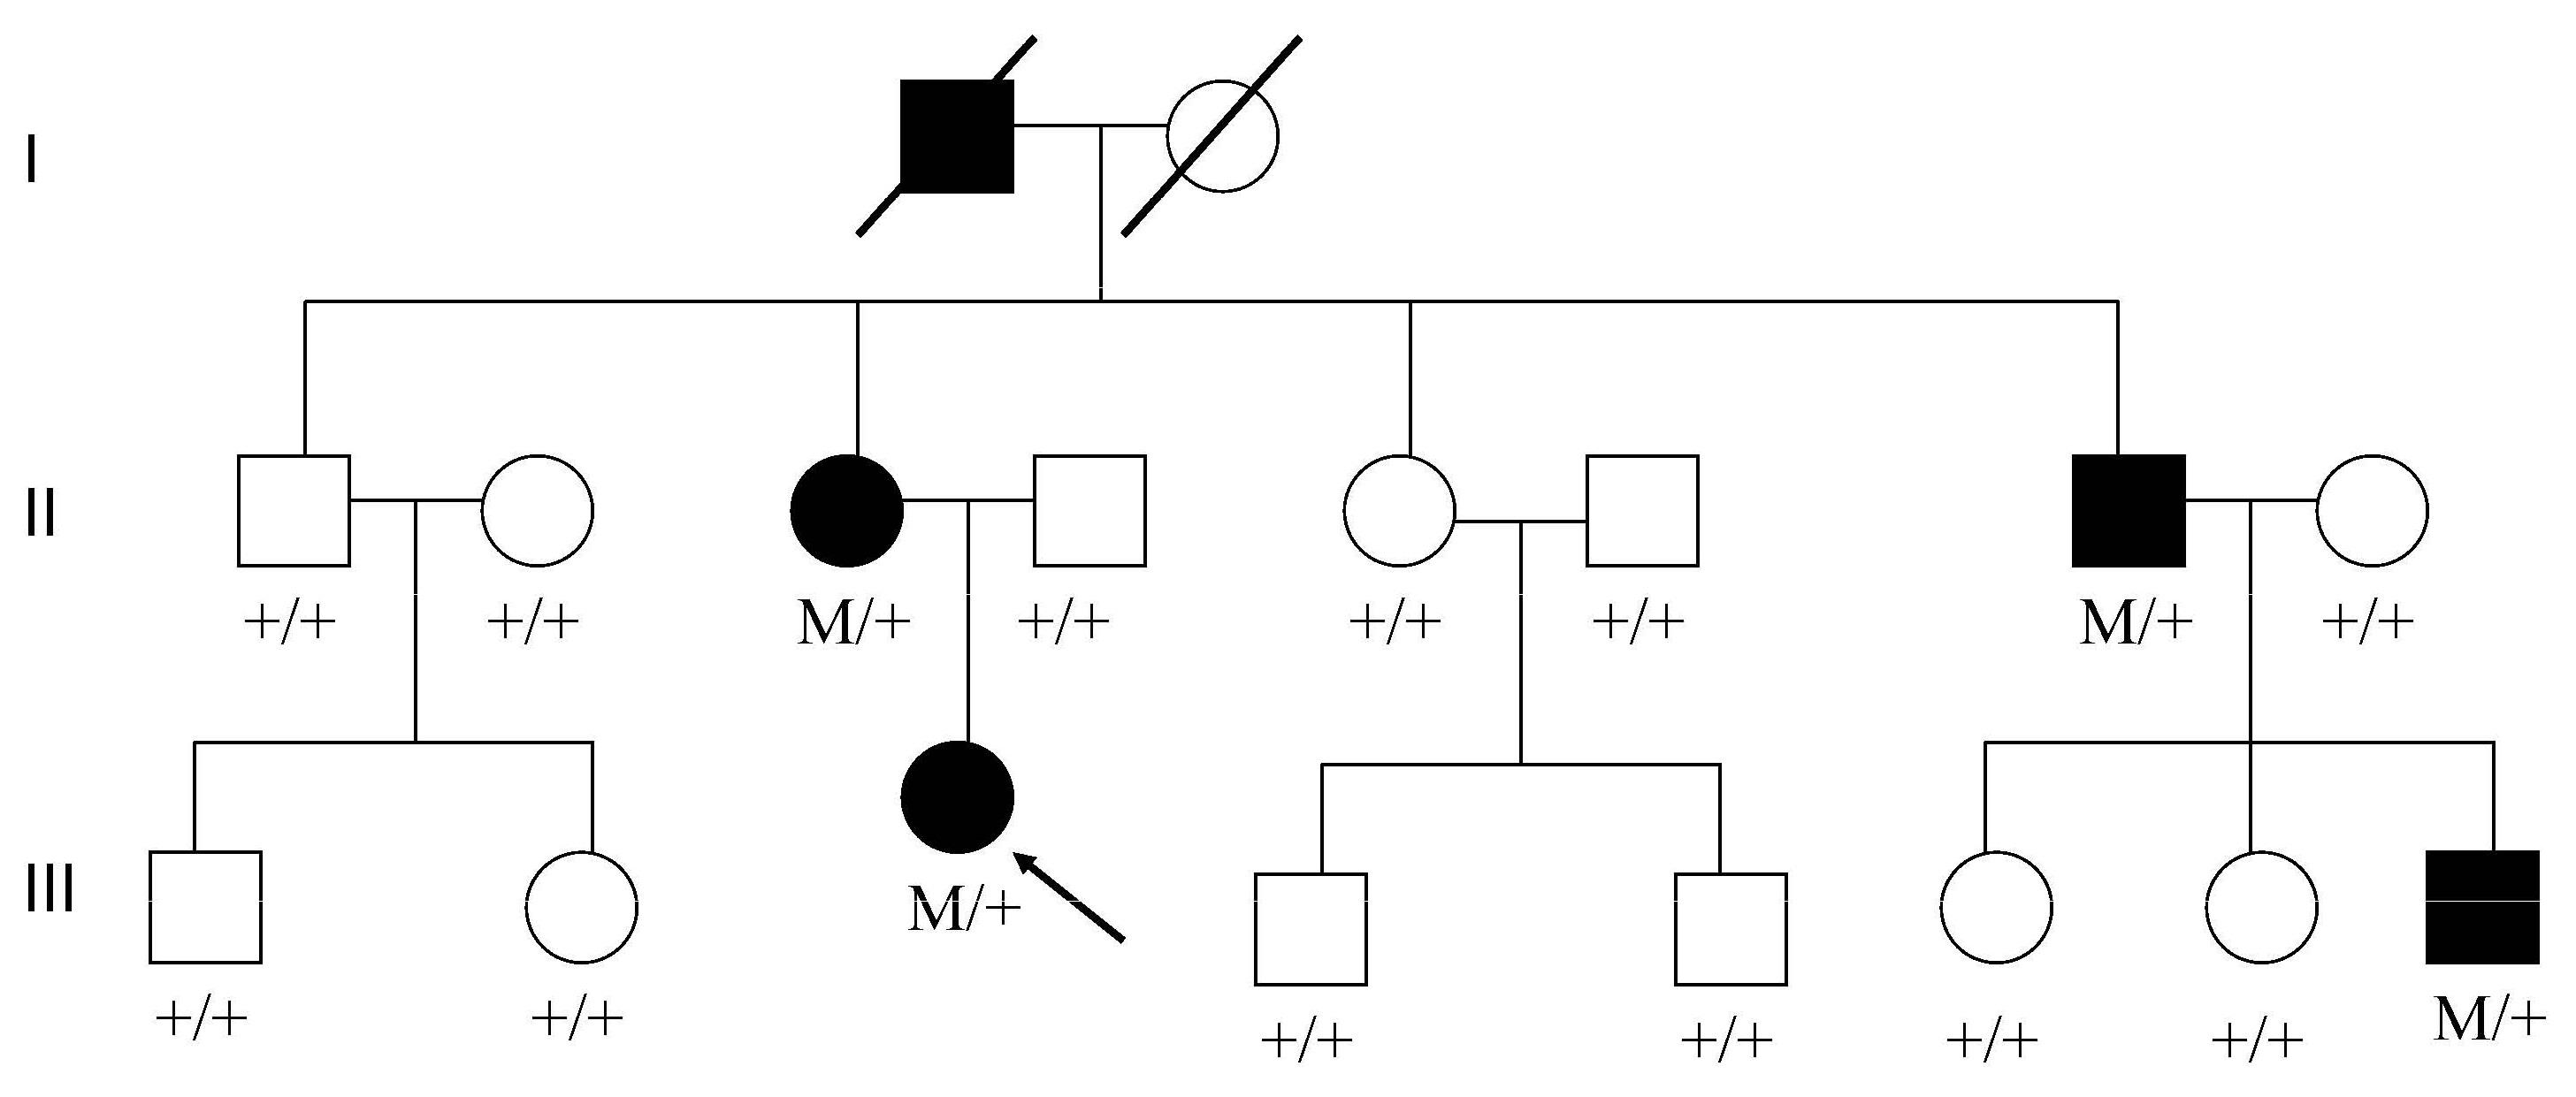 A novel mutation in c5l2 gene was associated with hyperlipidemia 1294420141205moesm2esmeg buycottarizona